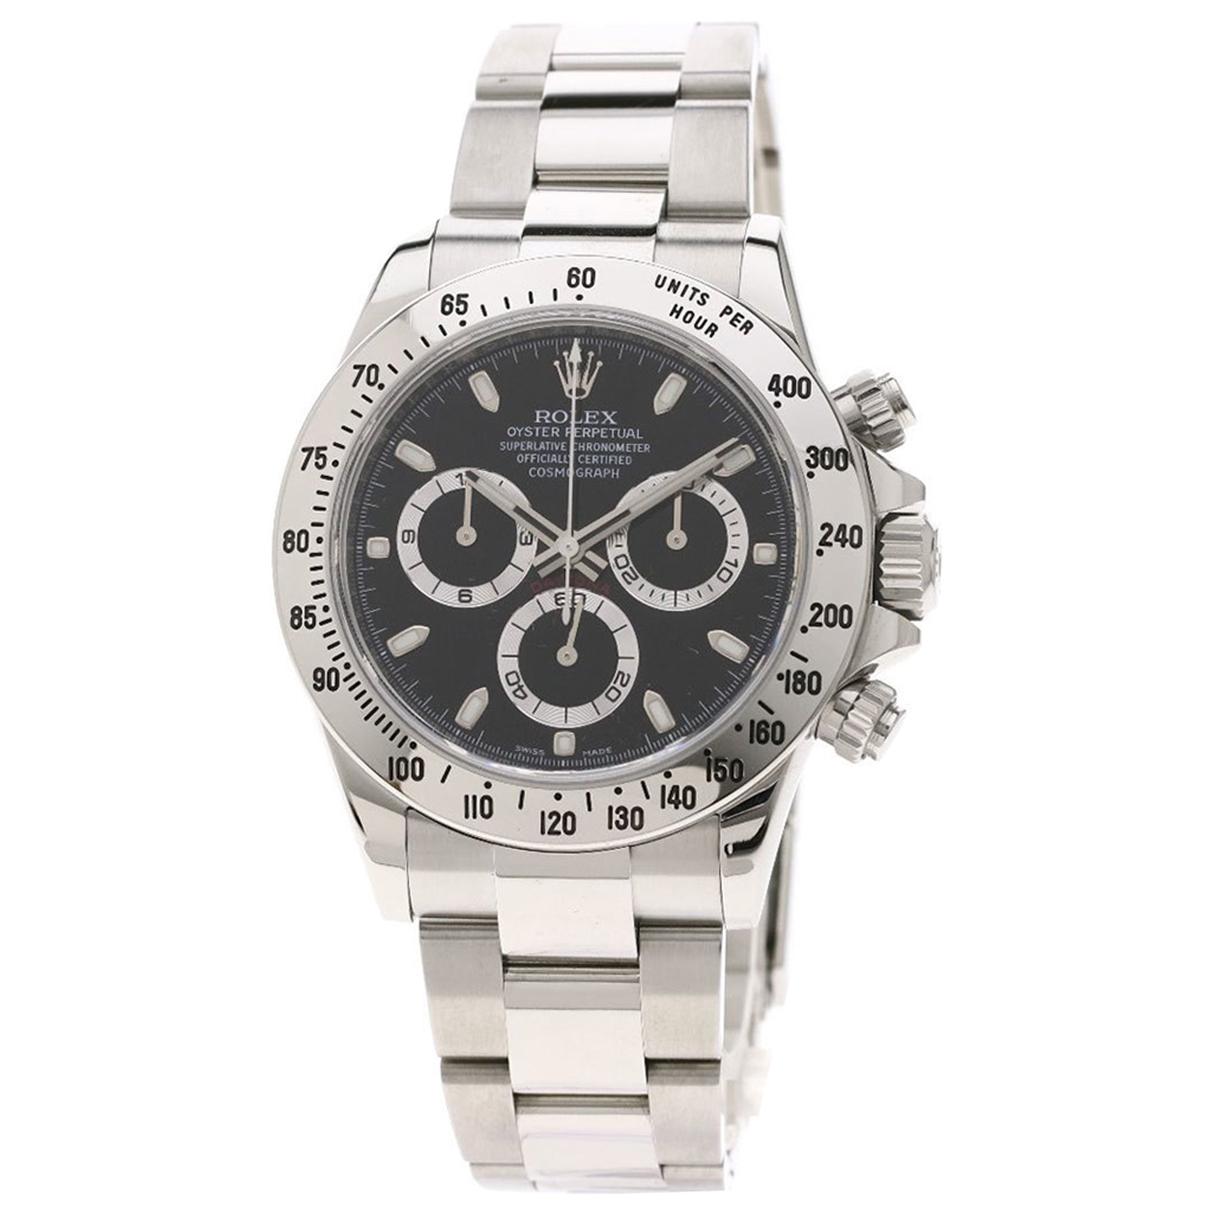 Relojes Daytona Rolex